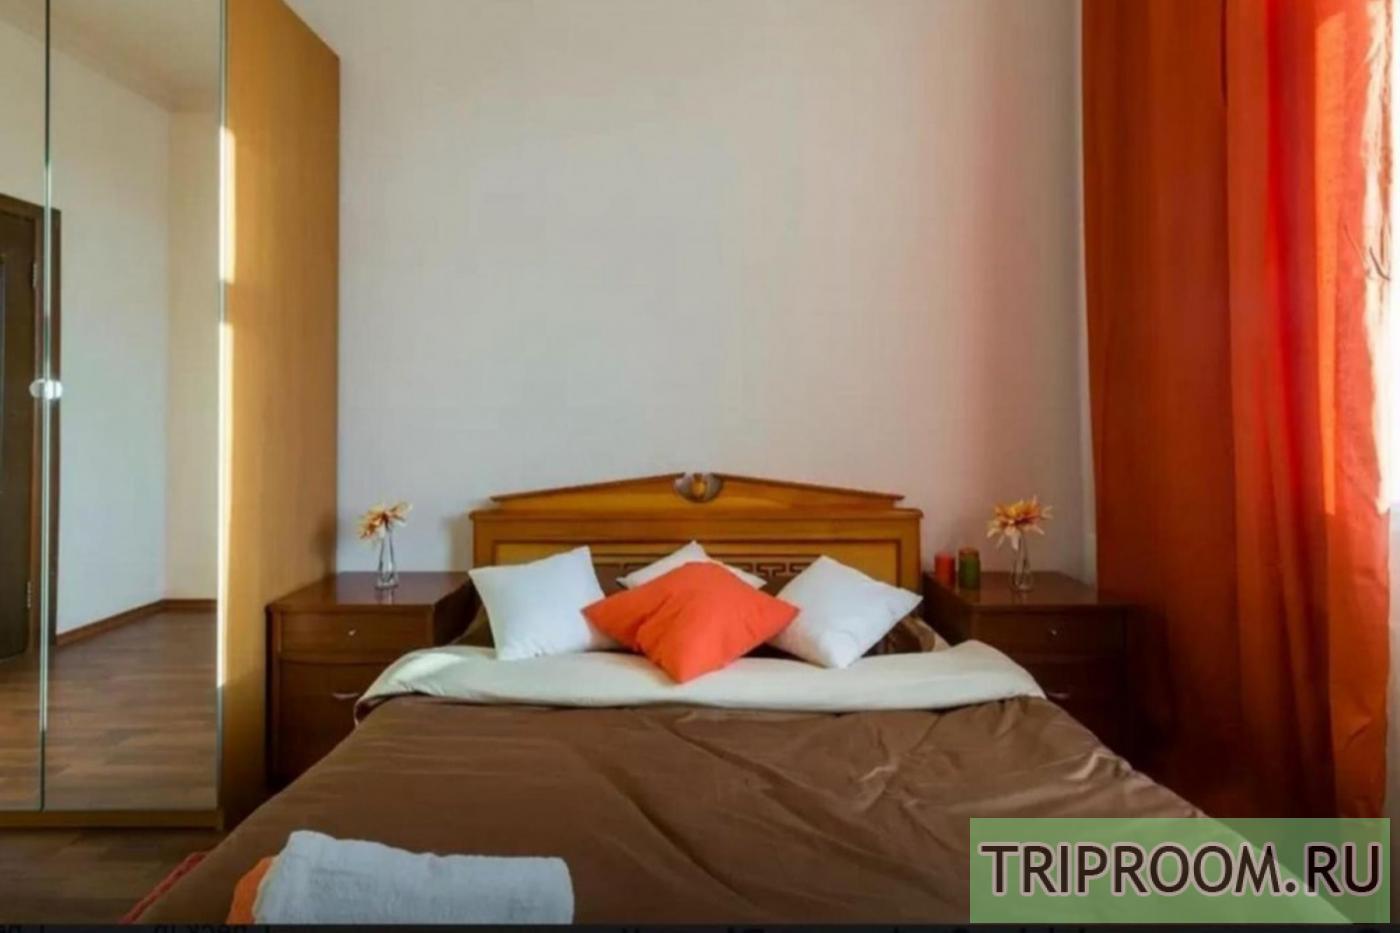 1-комнатная квартира посуточно (вариант № 33441), ул. проспект Соколова, фото № 2